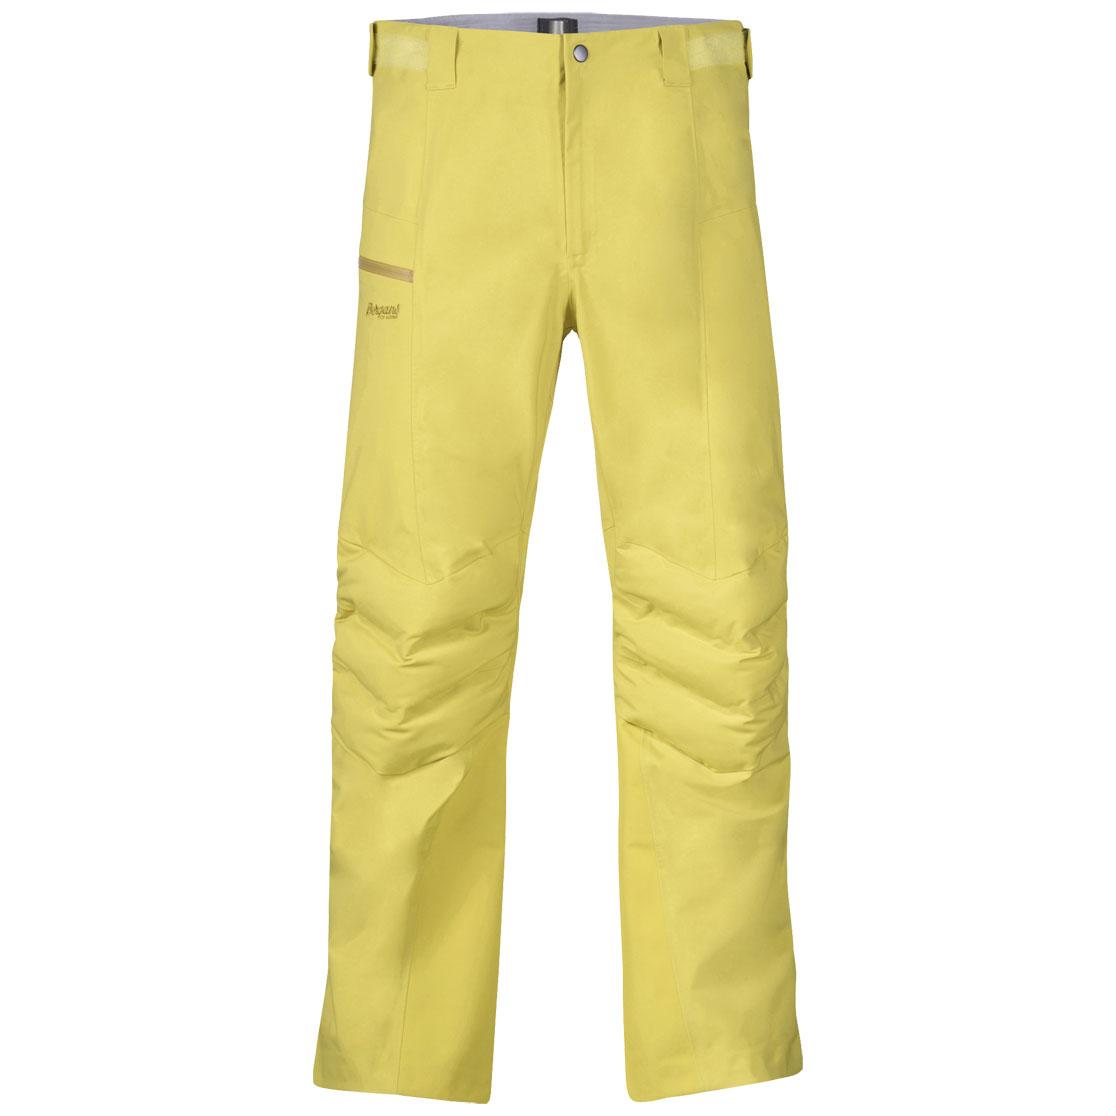 Bergans Hemsedal Hybrid Pants 17/18